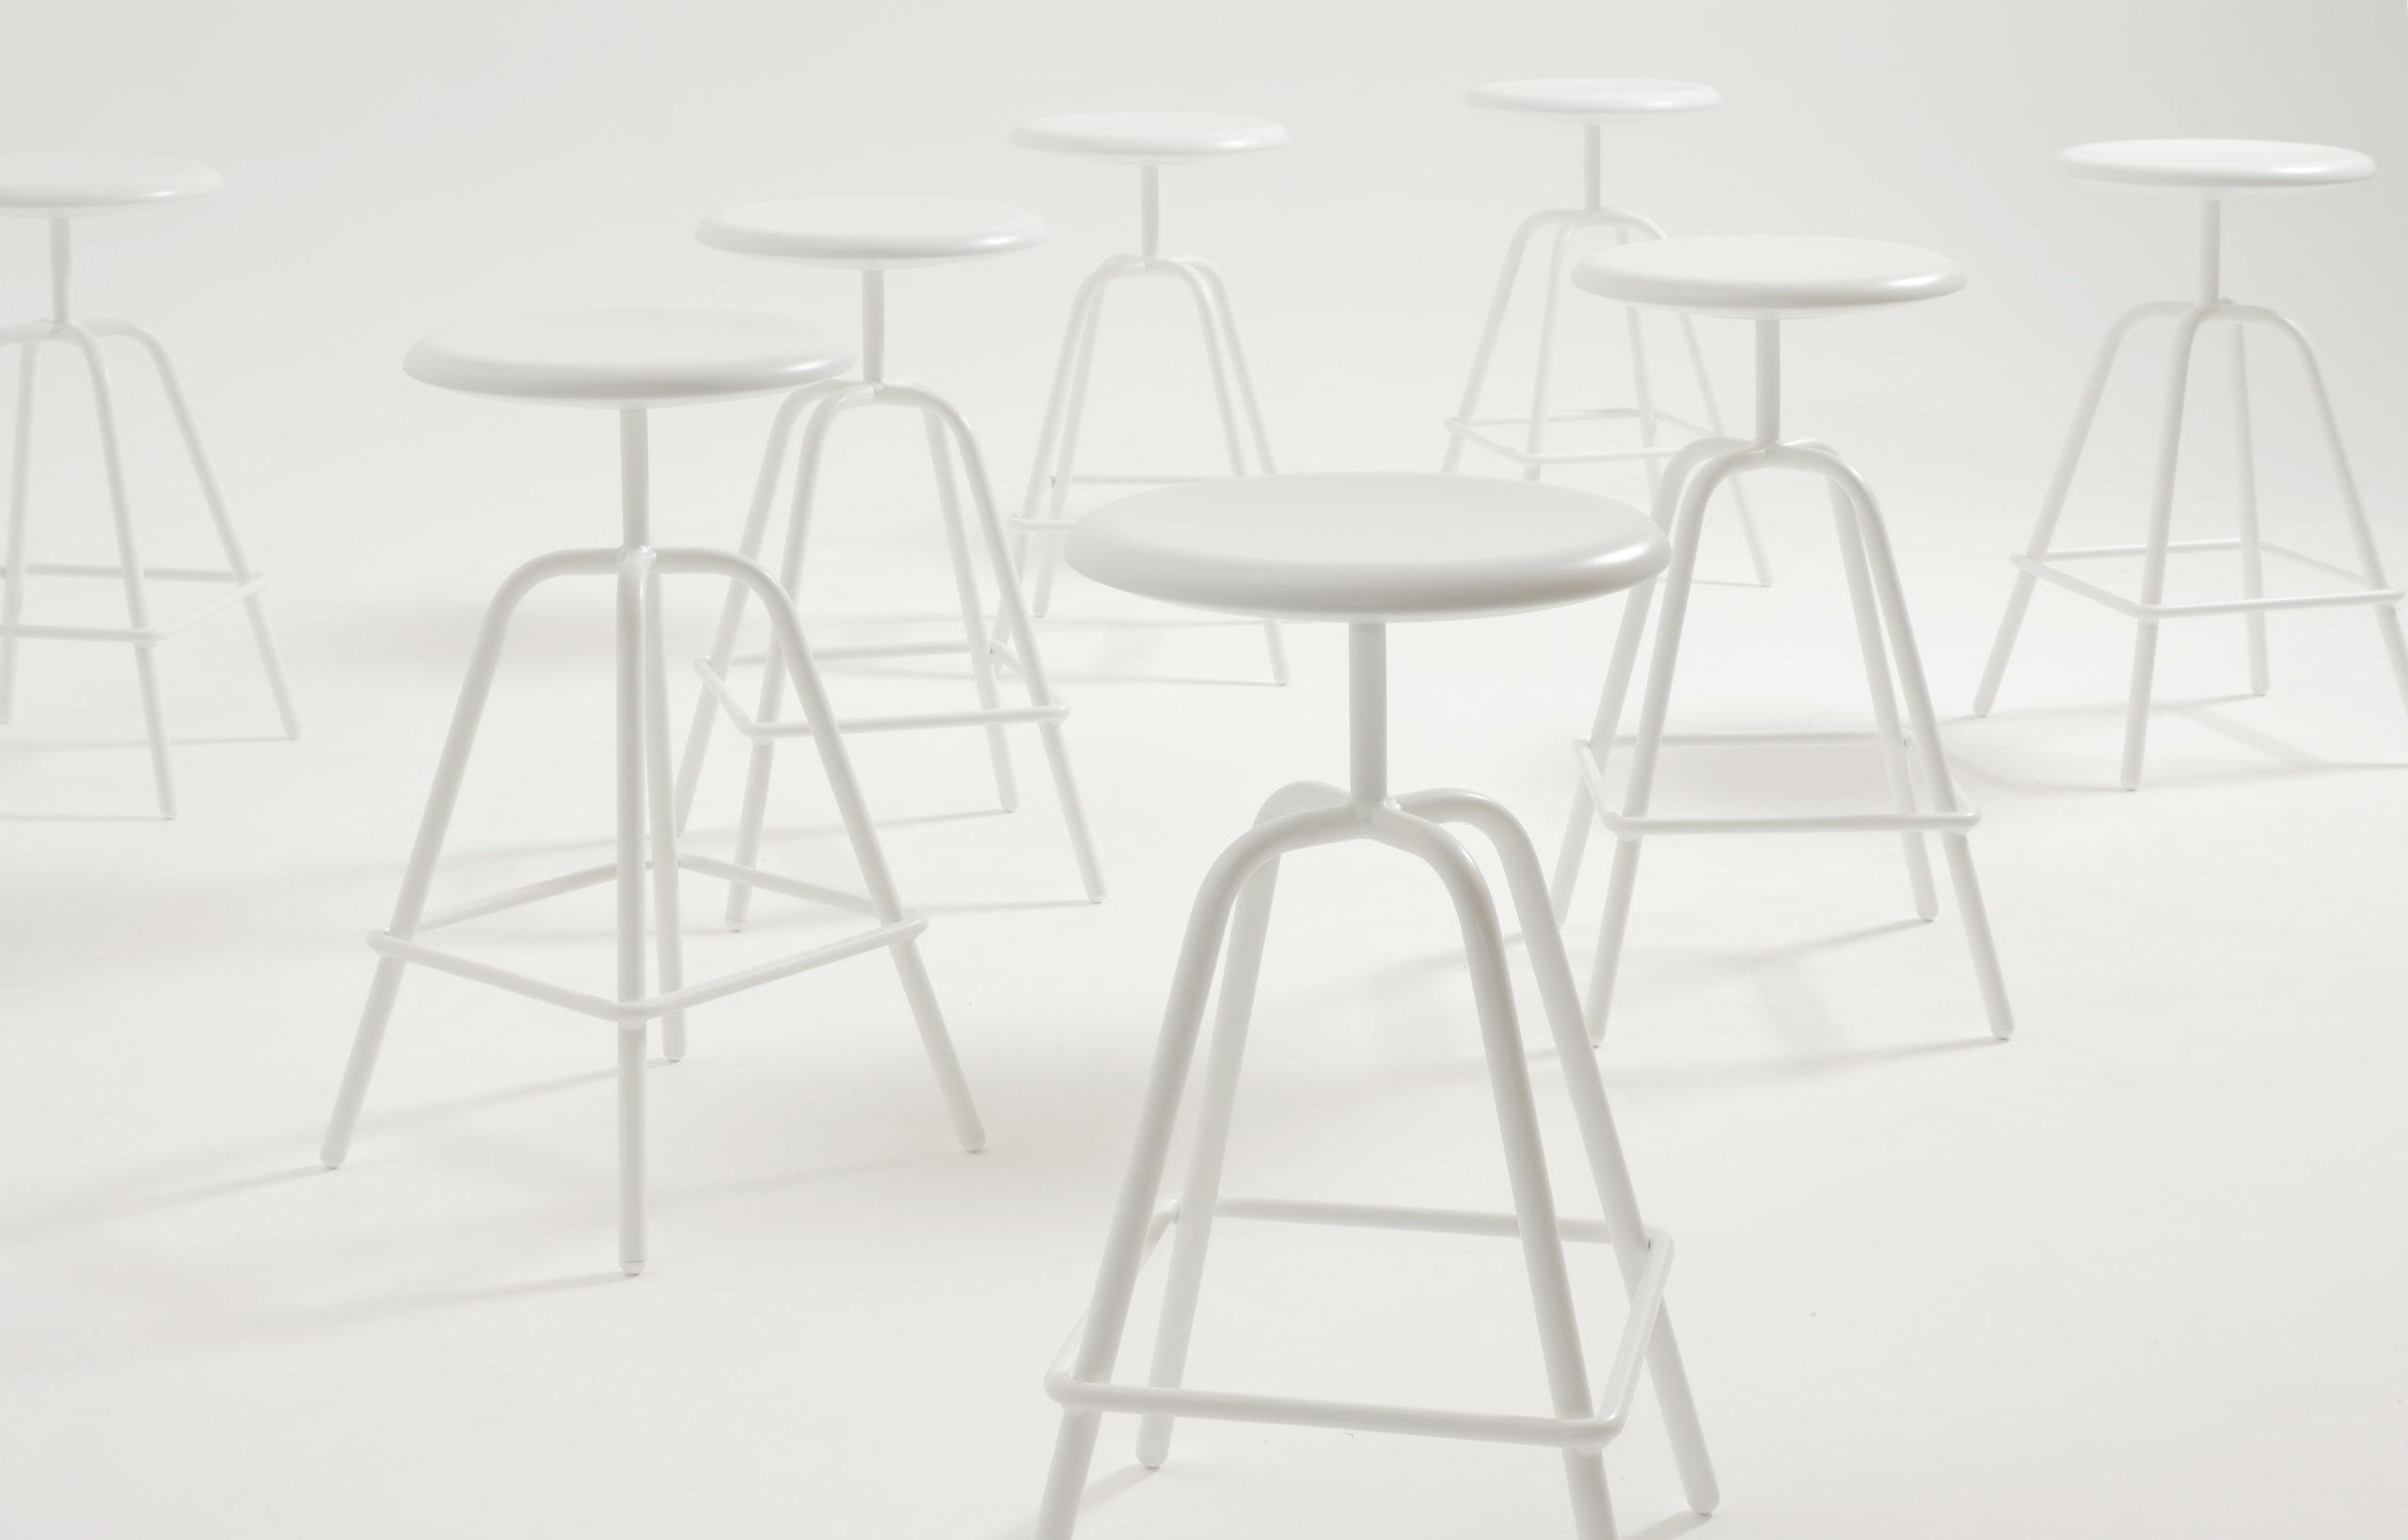 Herrenberger stool, wihte powder coated